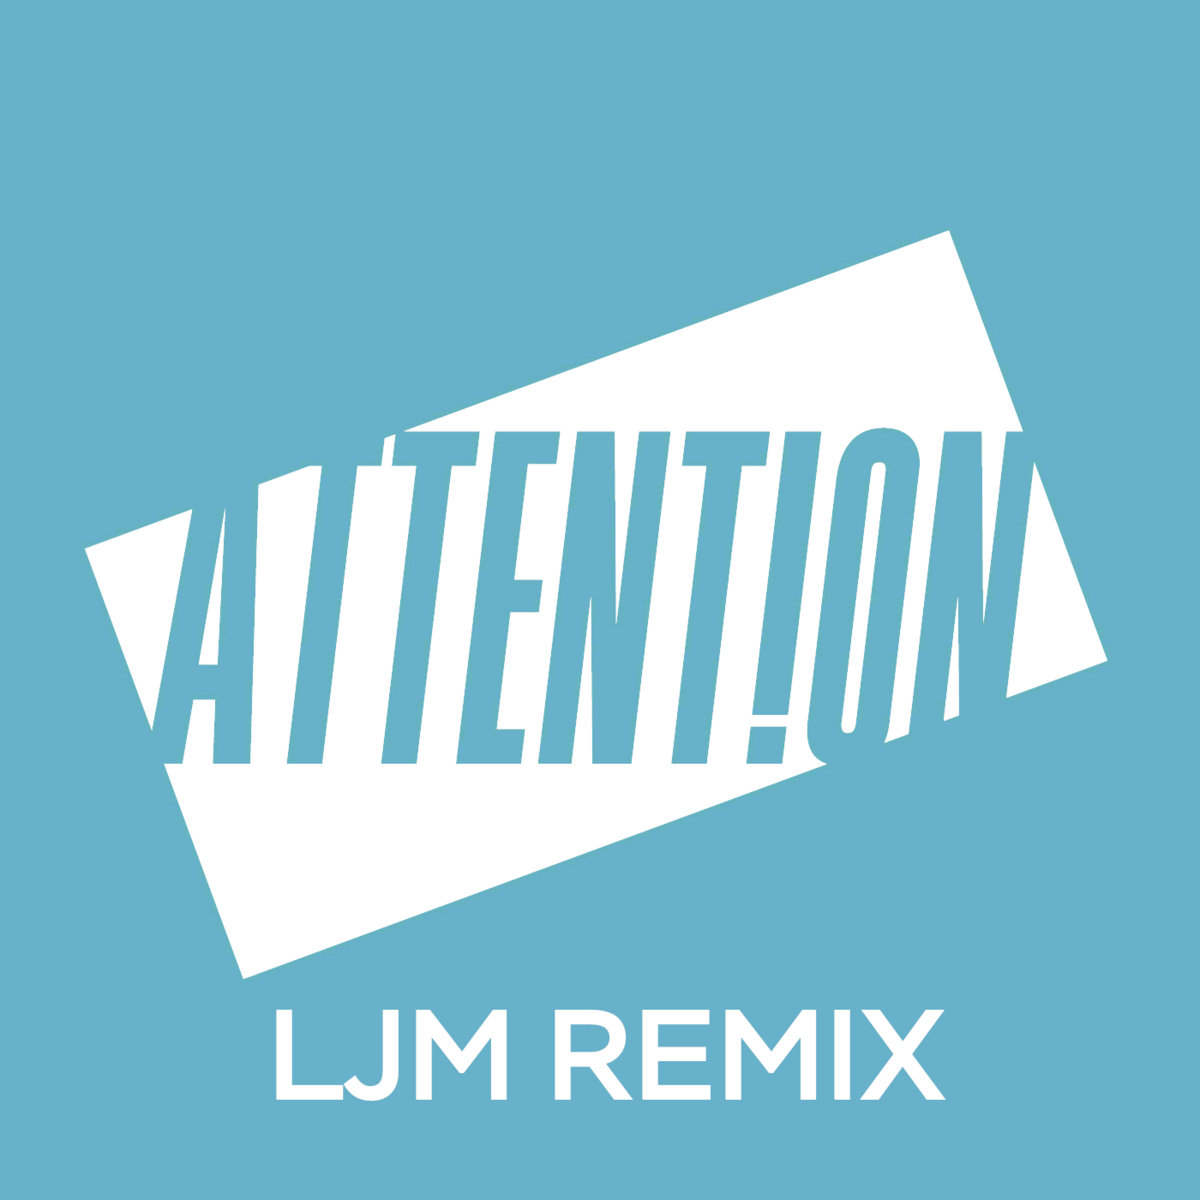 Charlie Puth - Attention (LJM Remix) | LJM